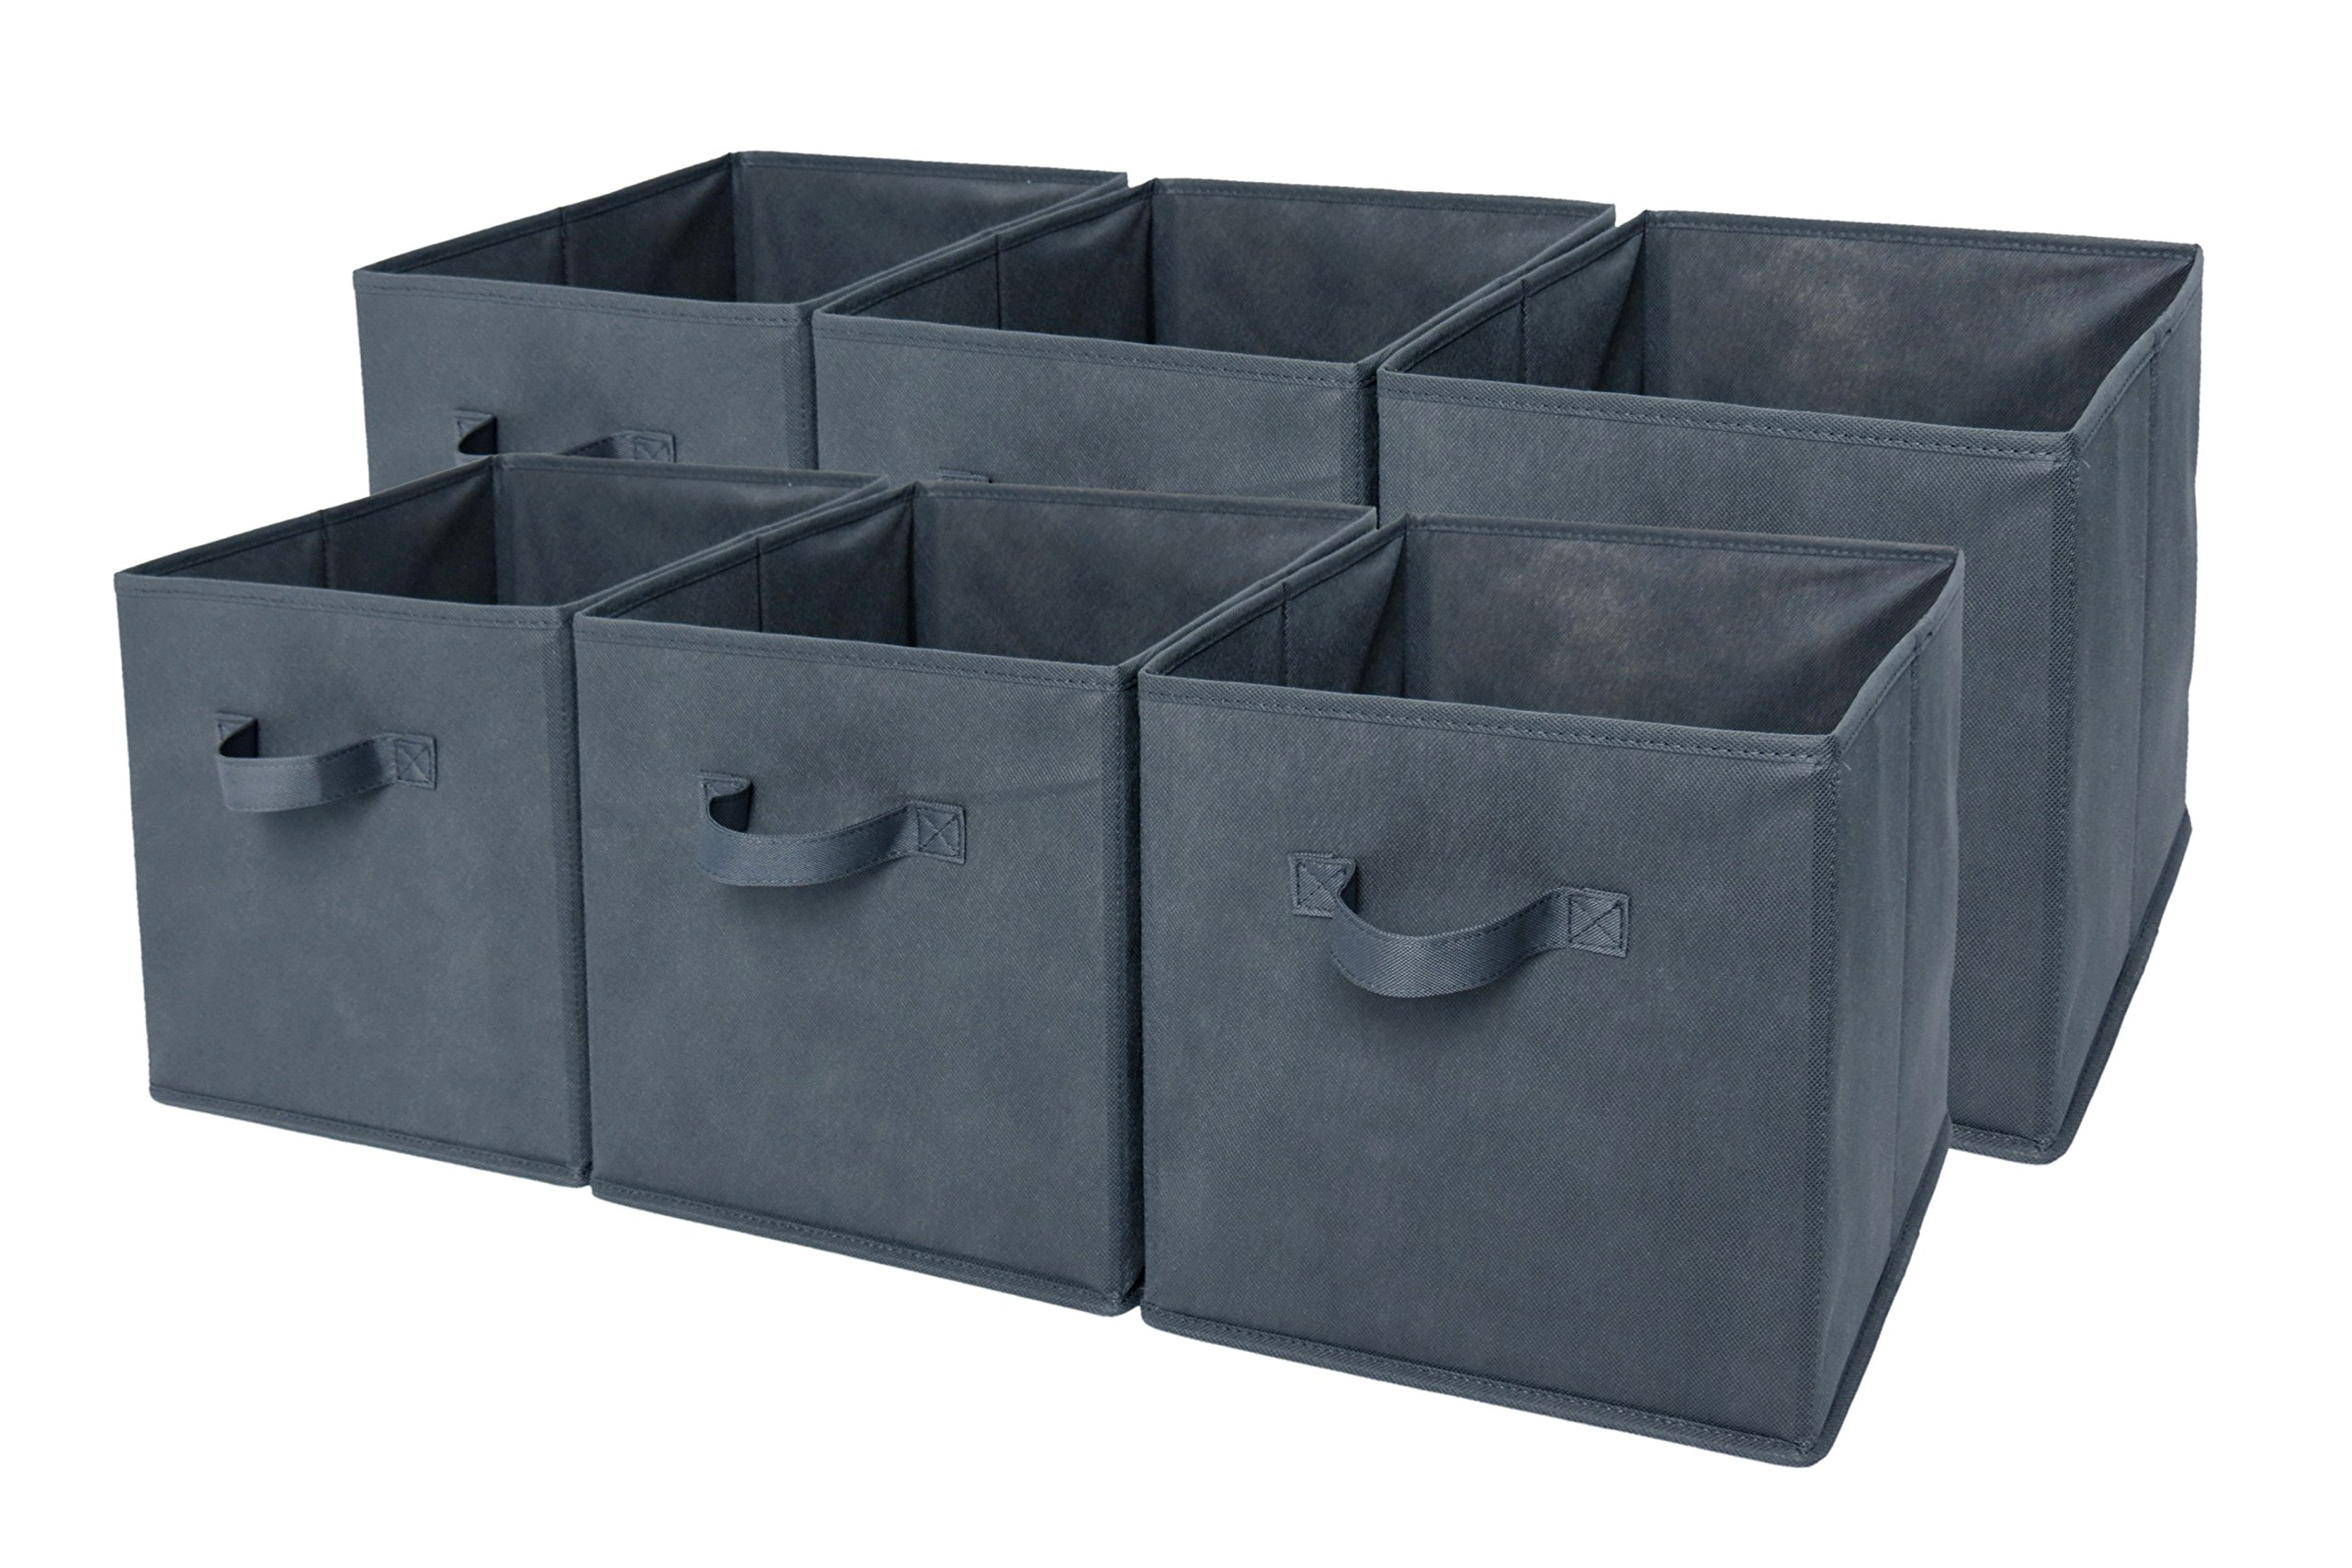 Sodynee Foldable Cloth Storage Cube Basket Bins Organizer Containers Drawers, 6 Pack, Grey by Sodynee